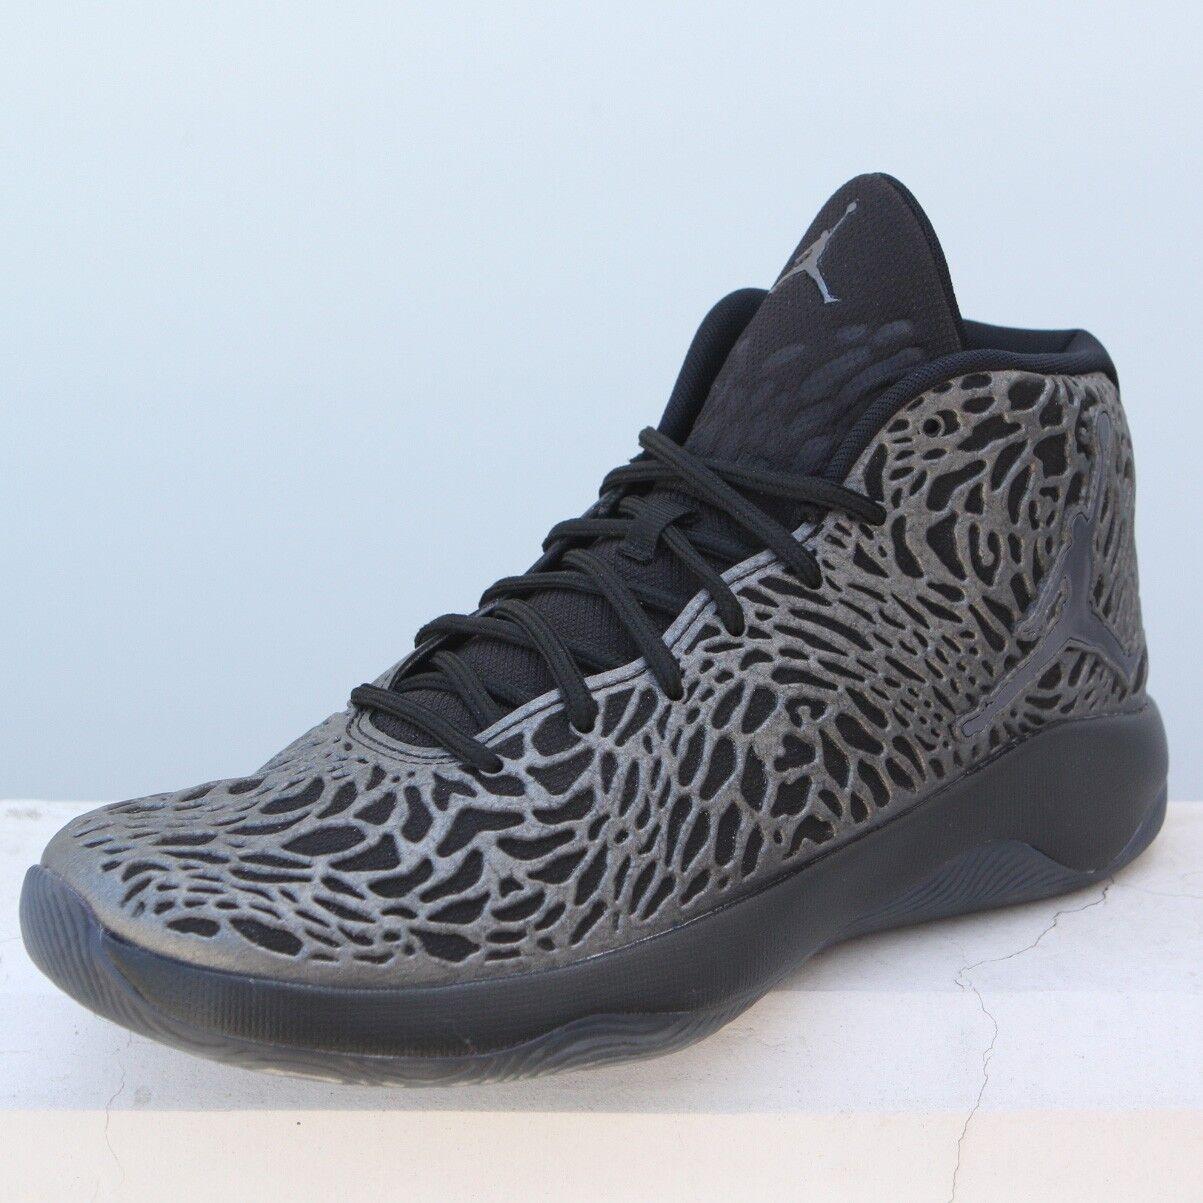 834268-010 Jordan Men  Jordan Ultra.Fly Basketball  black hematite grey